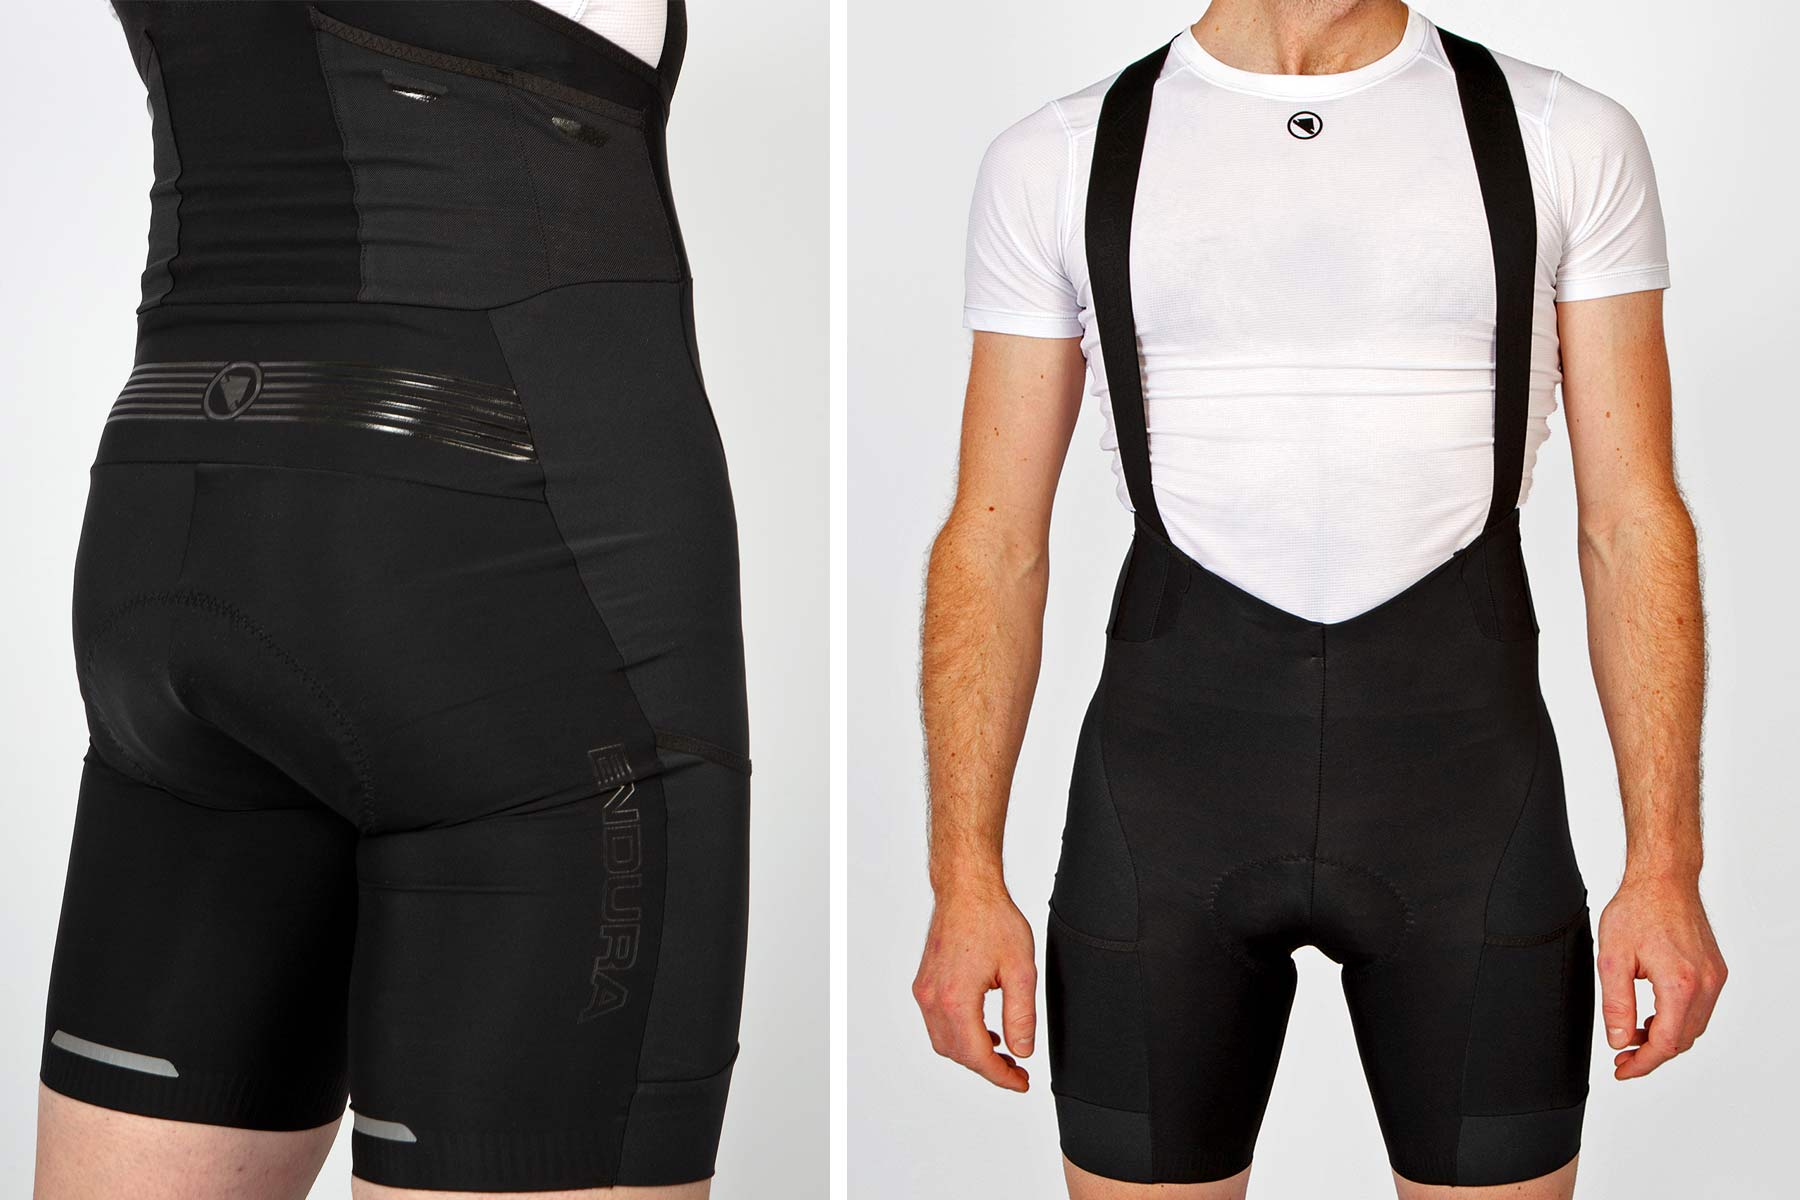 Endura GV500 Gravel Collection clothing, Dirty Reiver & Aberfoyle off-road-ready cycling kit,Reiver bibs